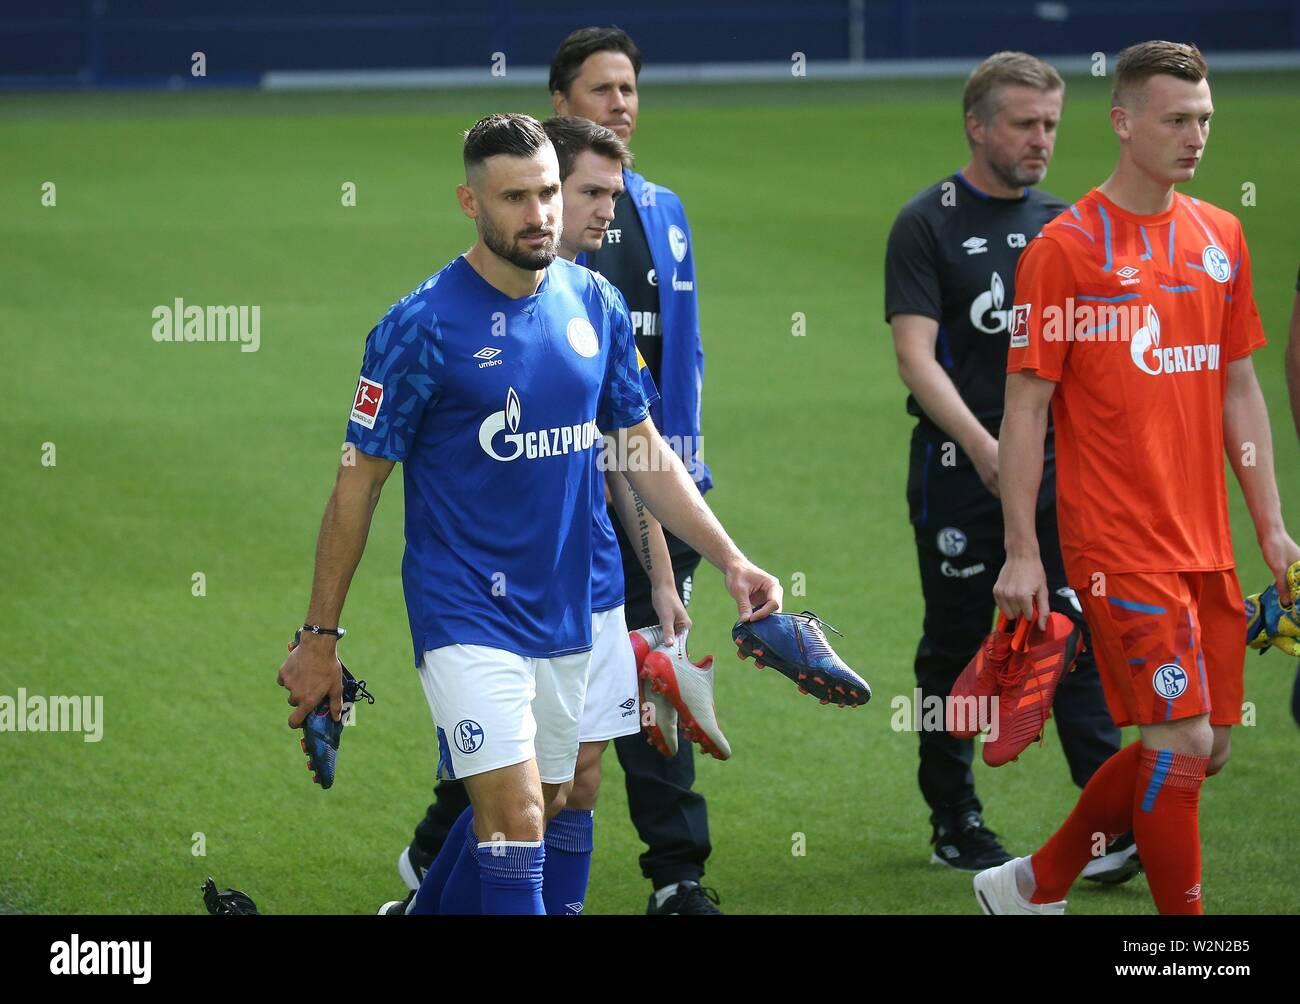 firo: 10.07.2019 Football, 2019/2020 FC Schalke 04, photo shoot, photo session Daniel Caligiuri and Markus Schubert   usage worldwide - Stock Image